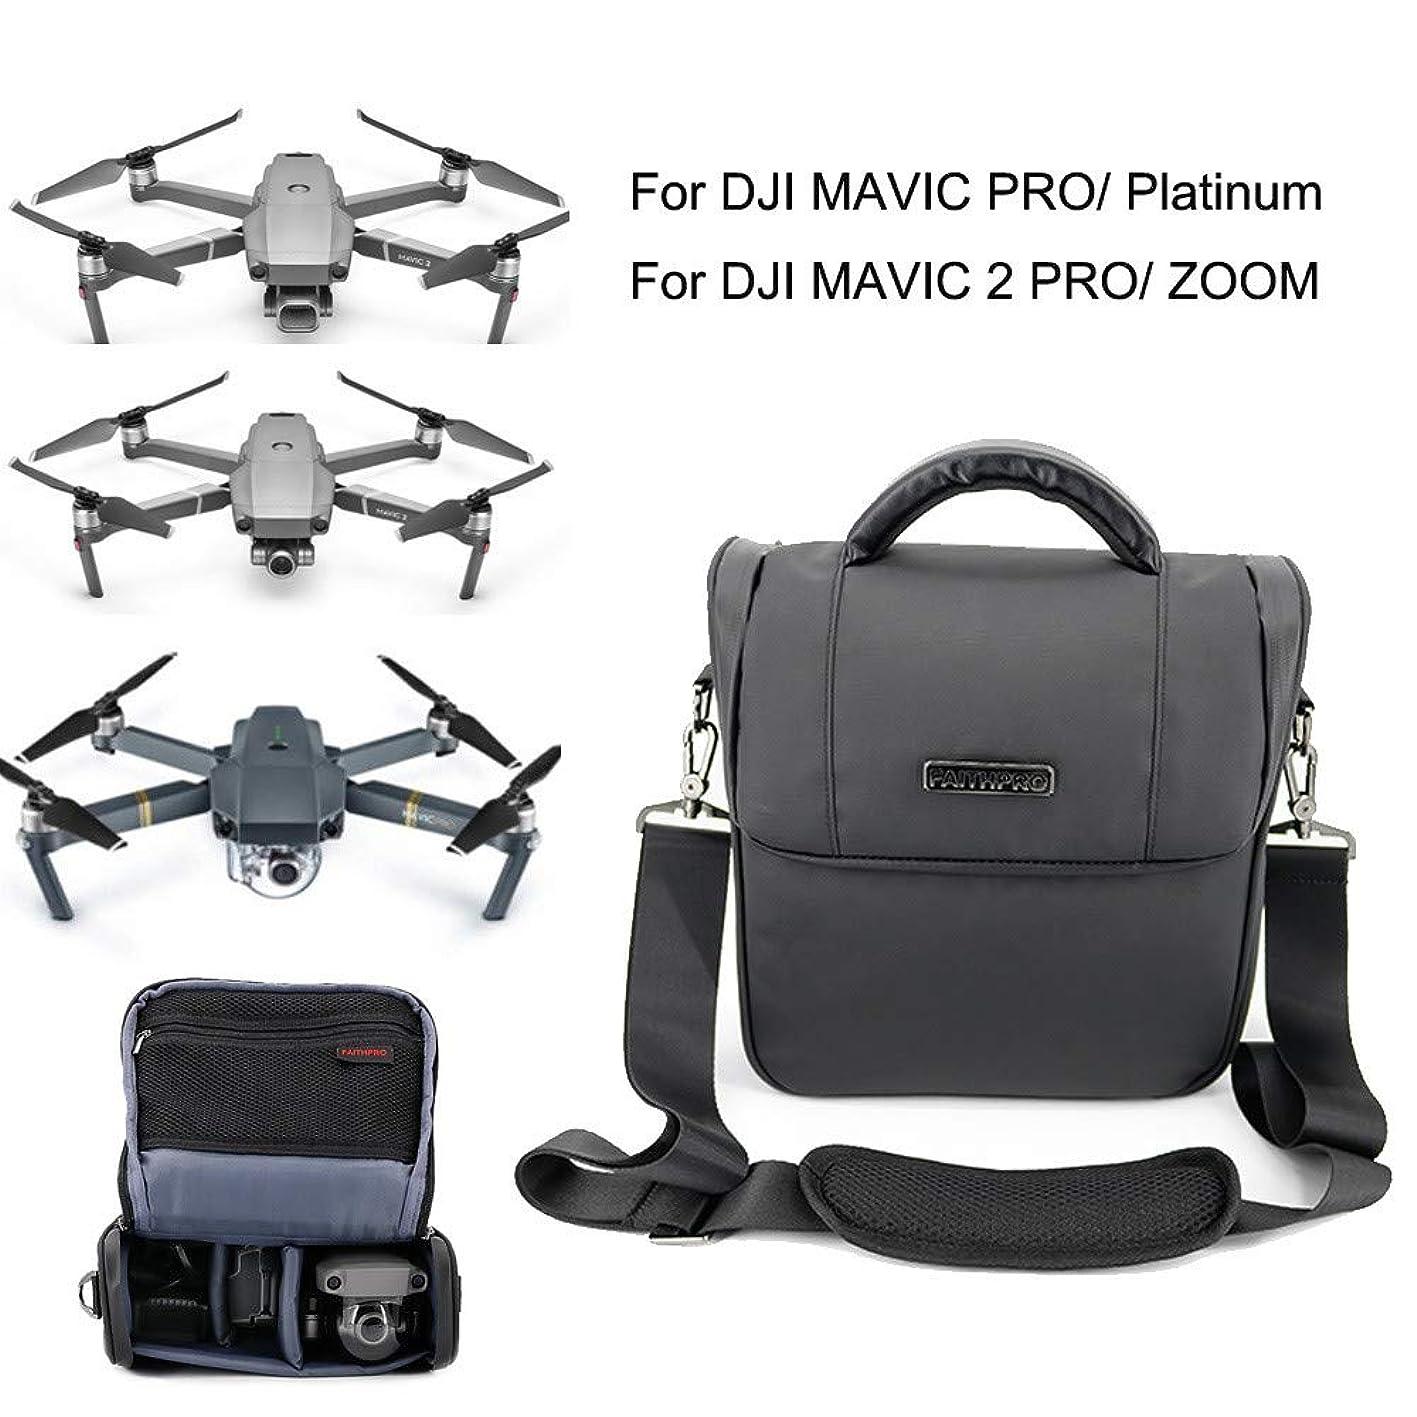 Aobiny Portable Carry Storage Shoulder Bag Handbag for DJI Mavic 2 Pro/Zoom Series Drone (Black) ayzgvpmxbkn152